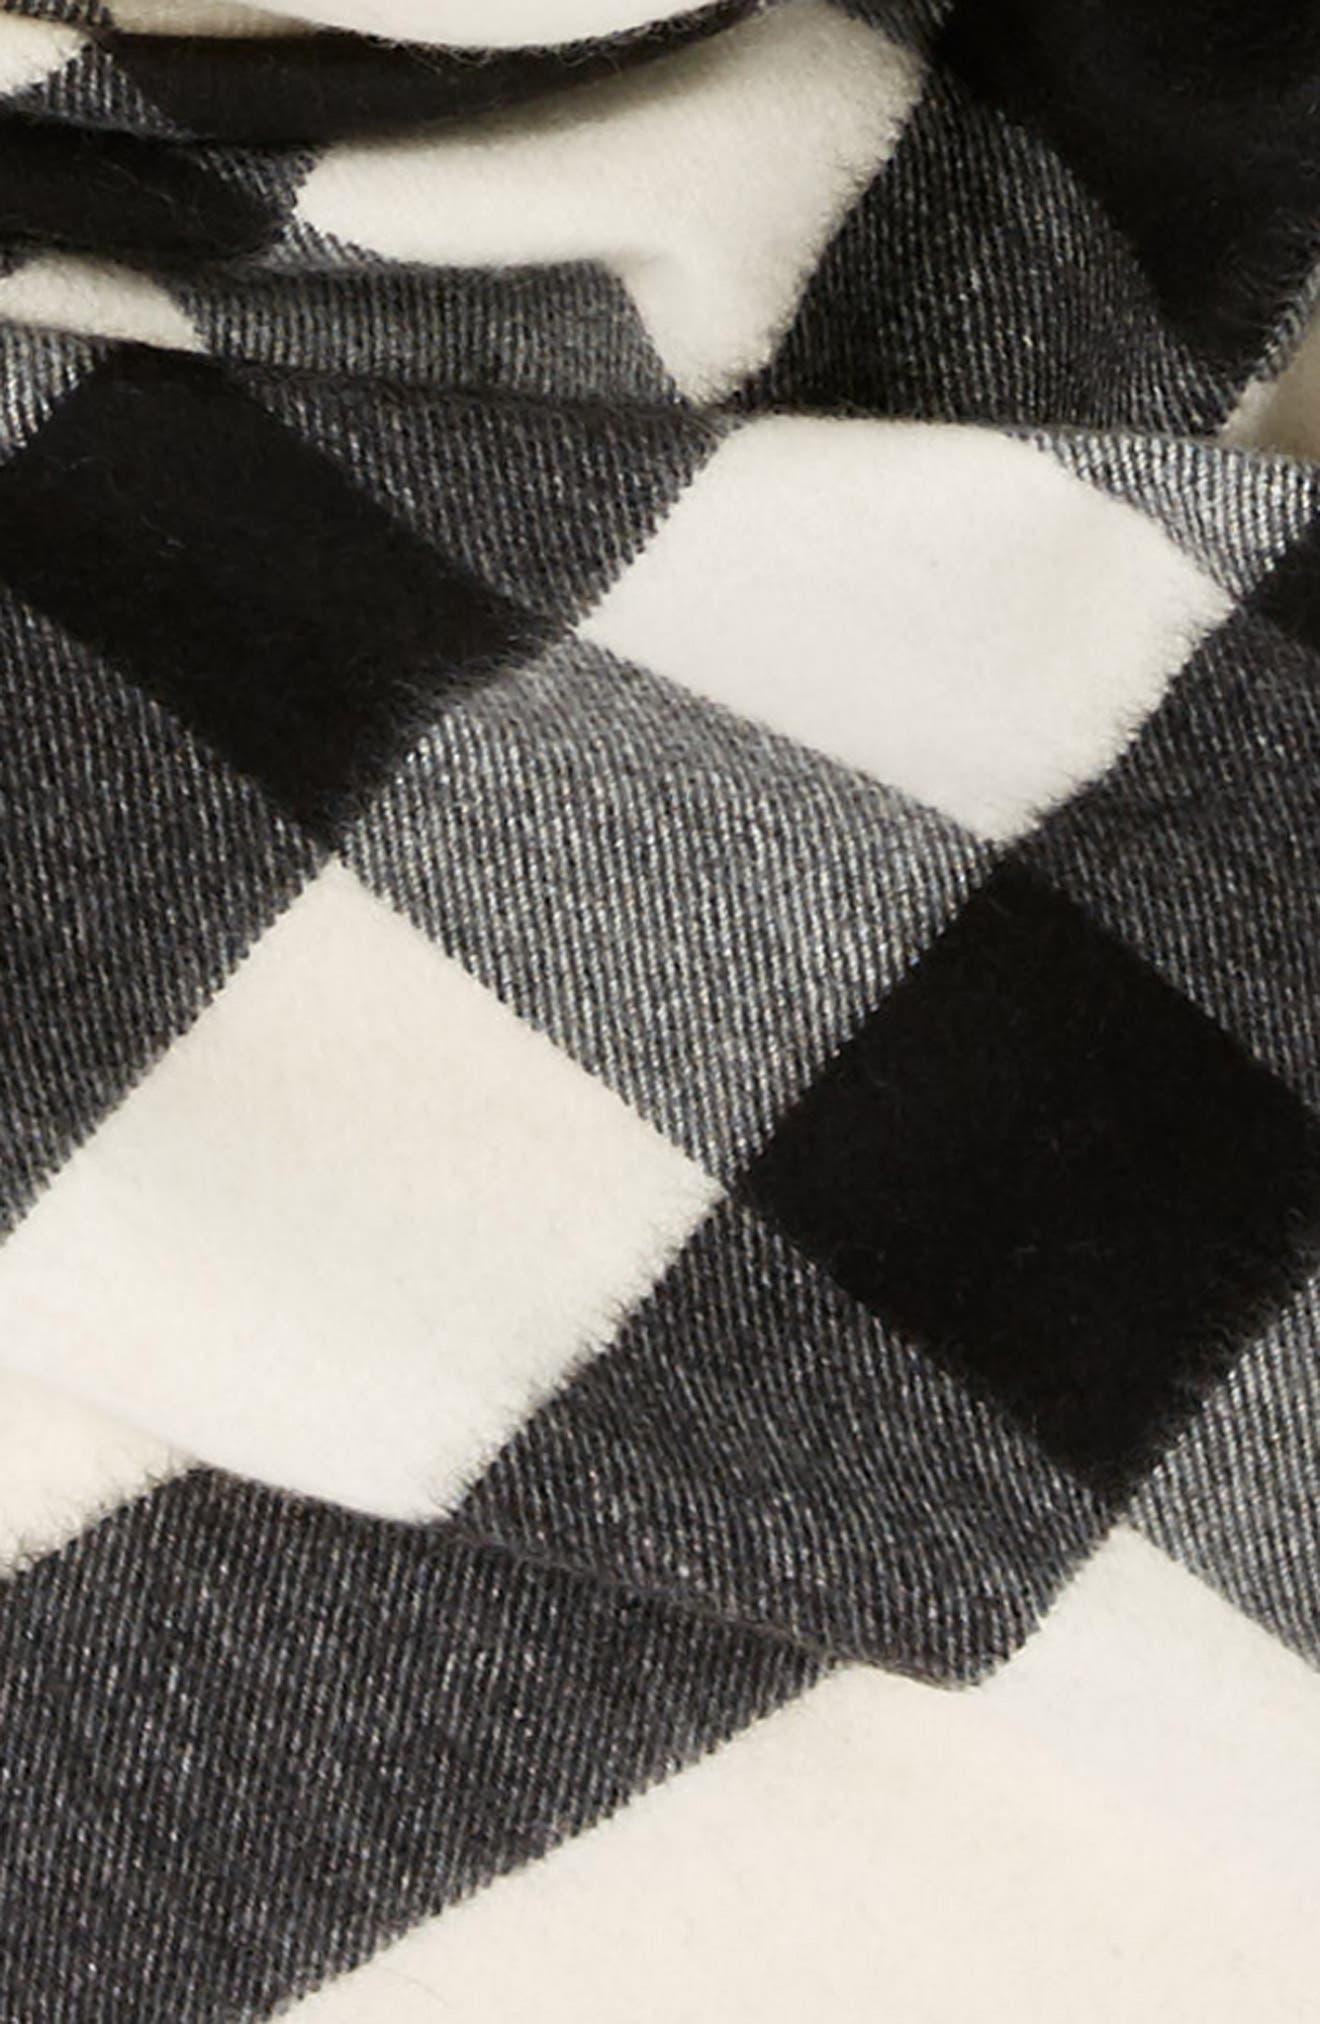 Mega Check Cashmere Scarf,                             Alternate thumbnail 4, color,                             NATURAL WHITE